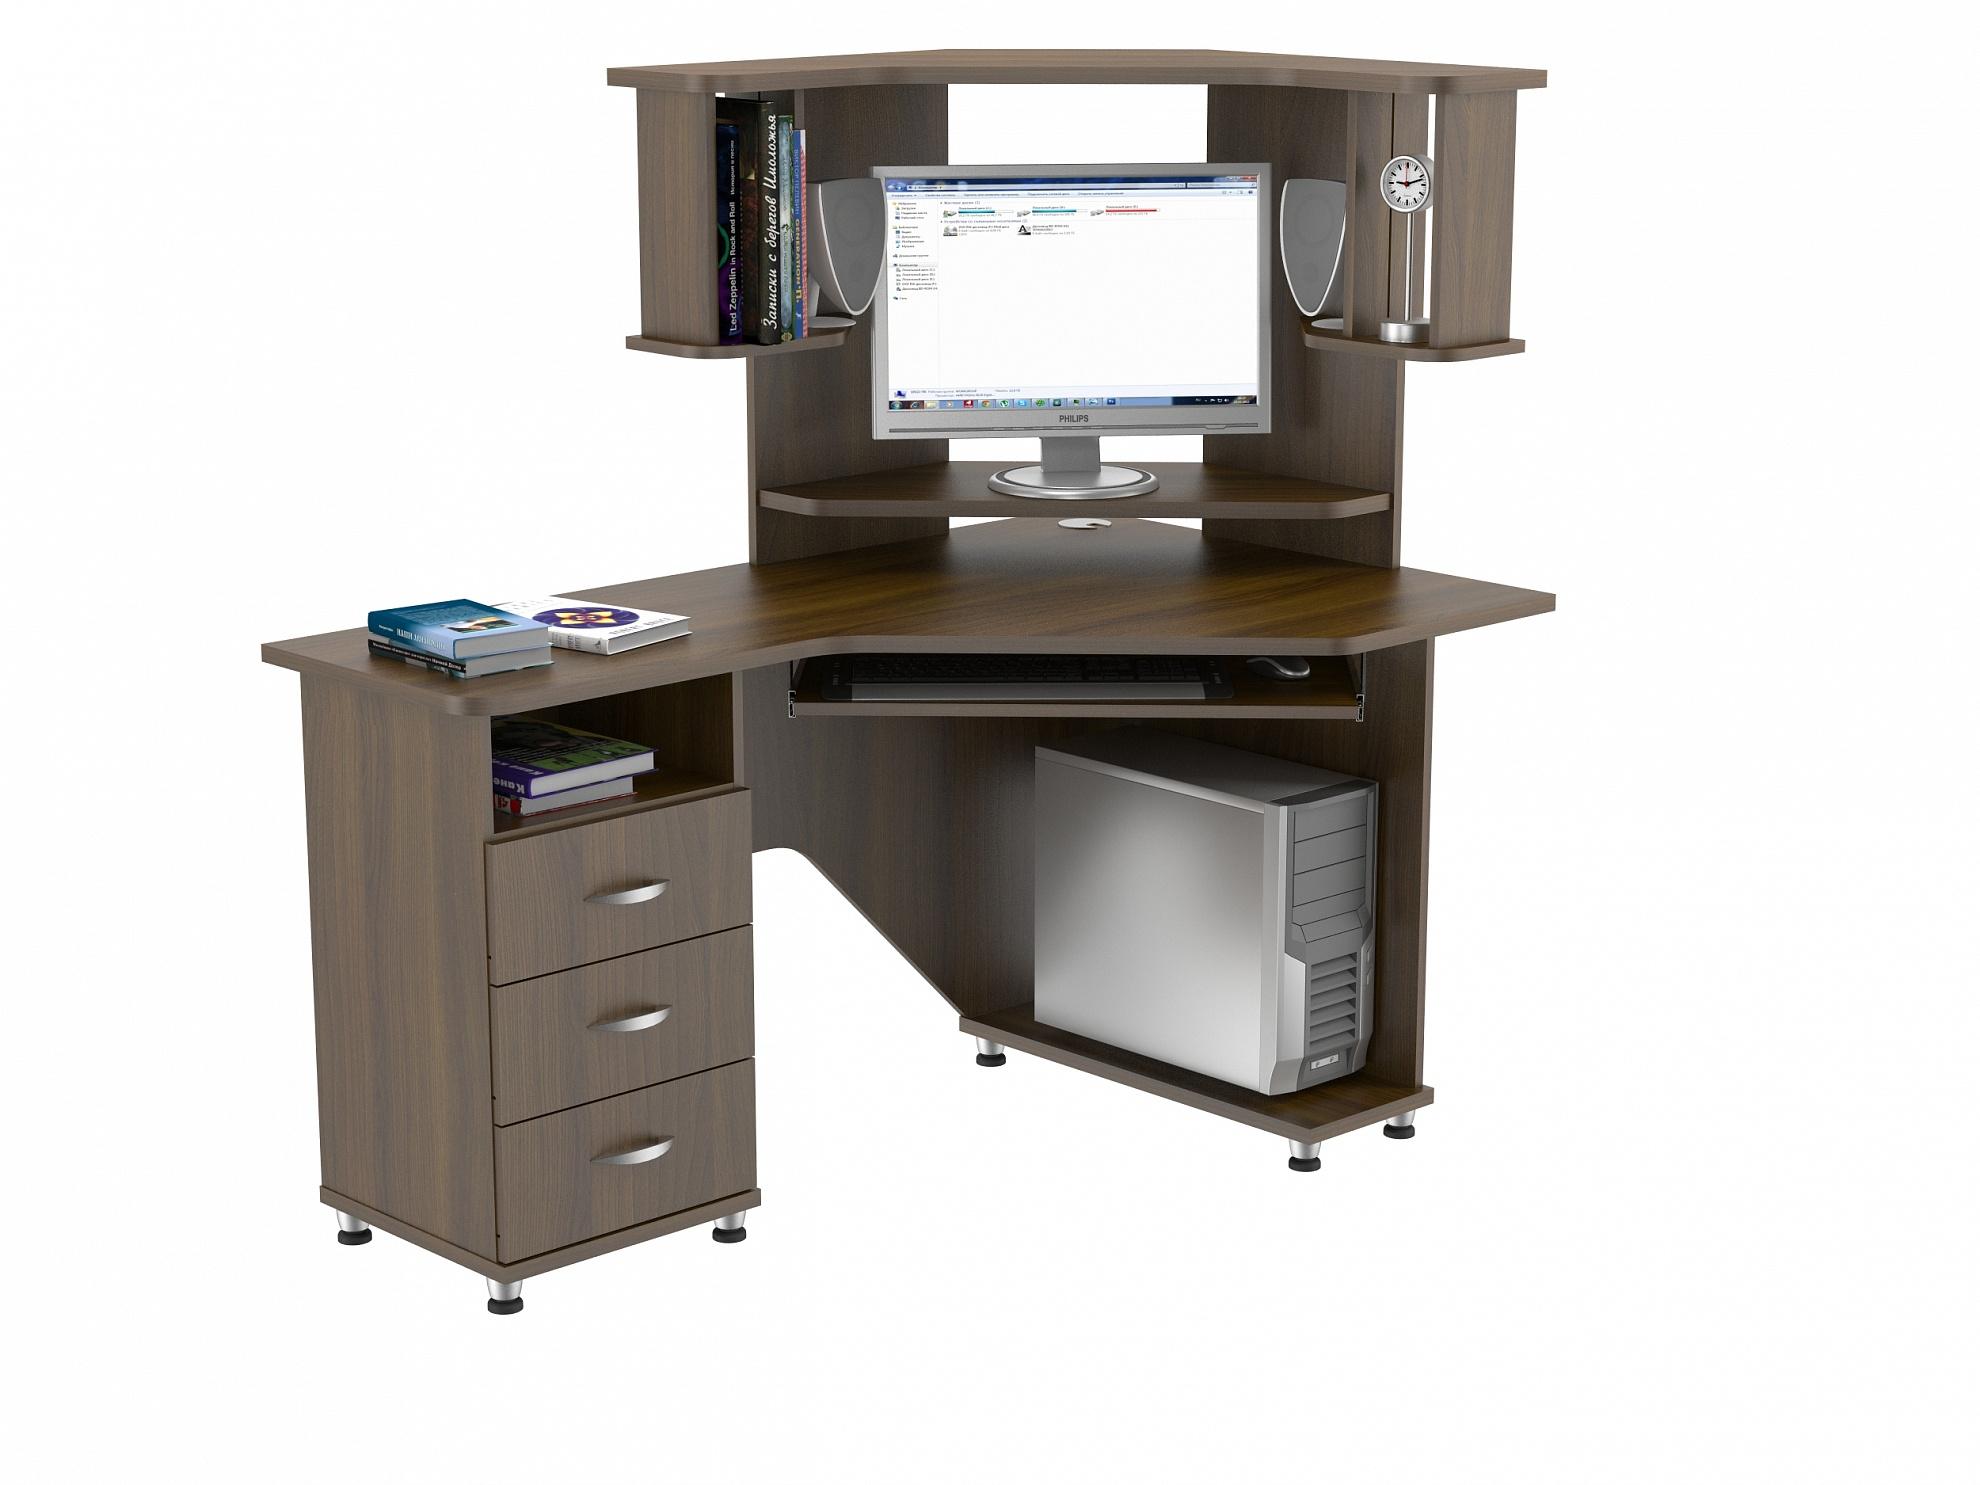 Компьютерный стол КС 20-18м1